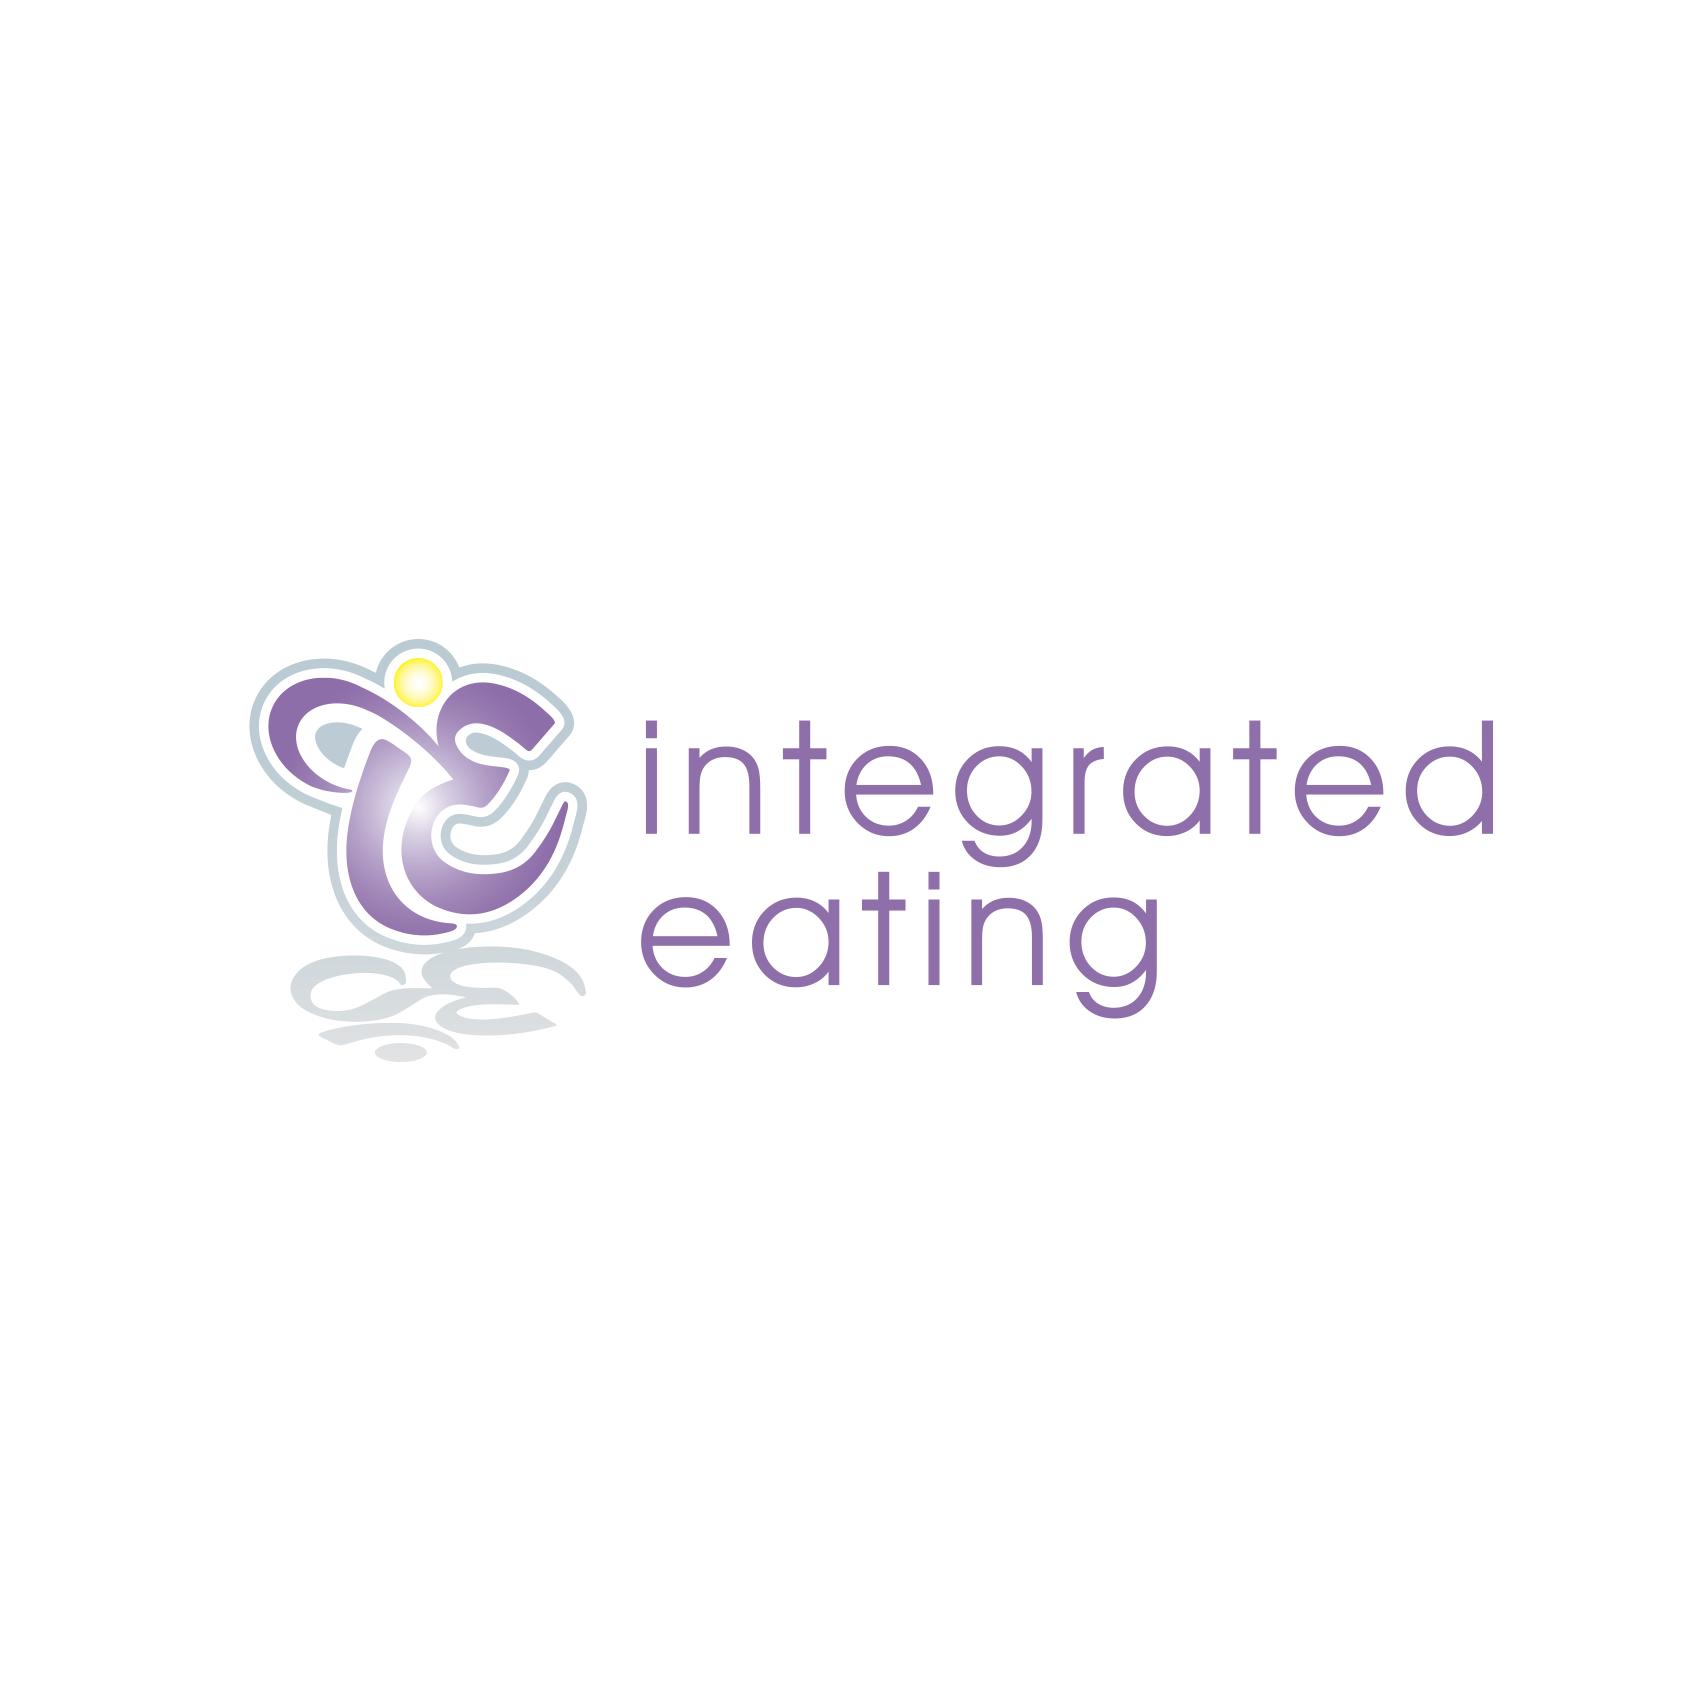 Integrated Eating Dietetics - Nutrition PLLC